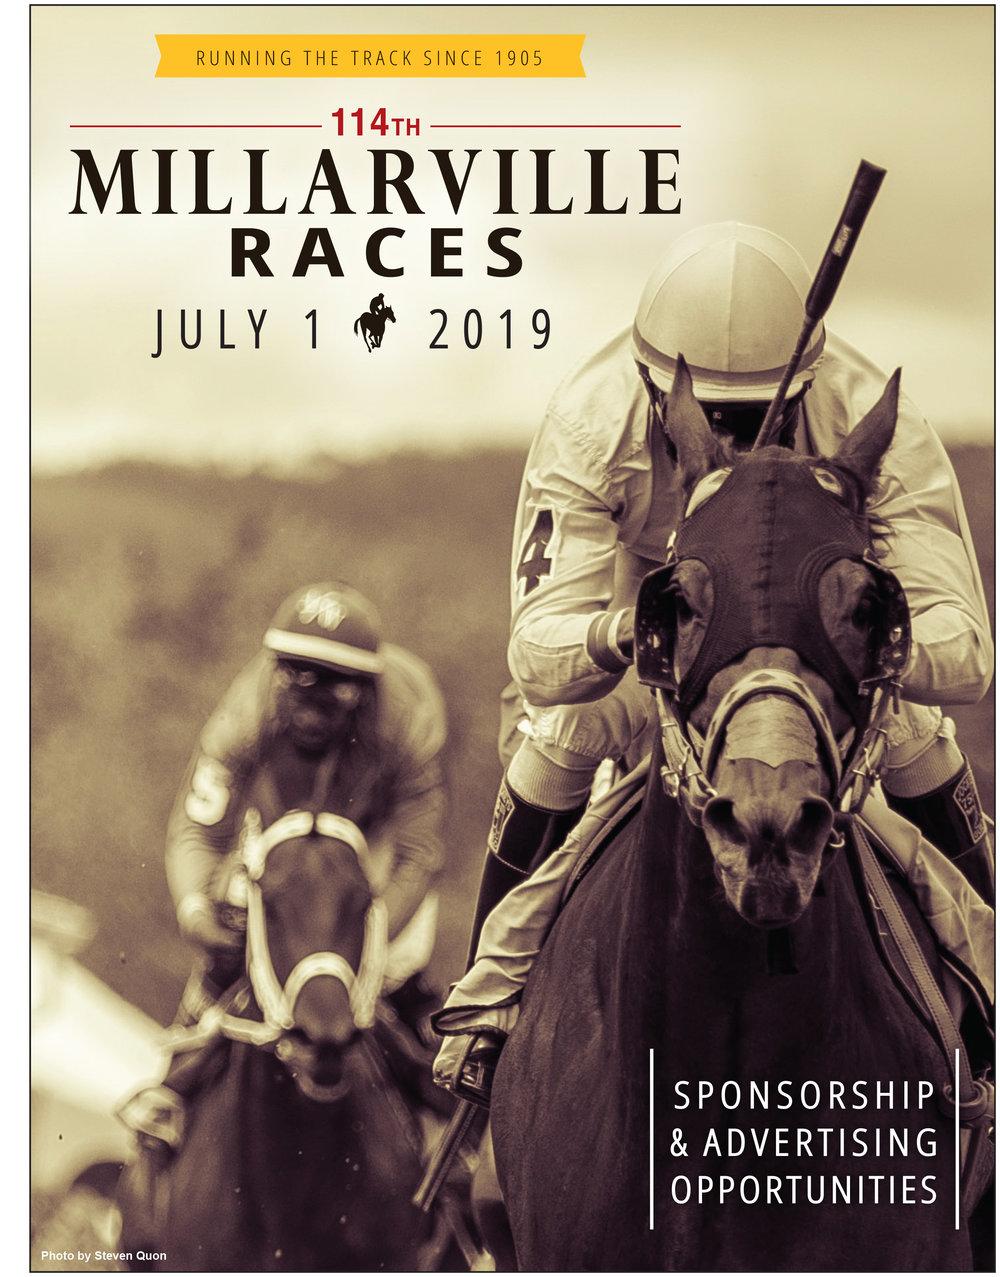 2019 Races Sponsorship Packgage FINAL - Page 1.jpg